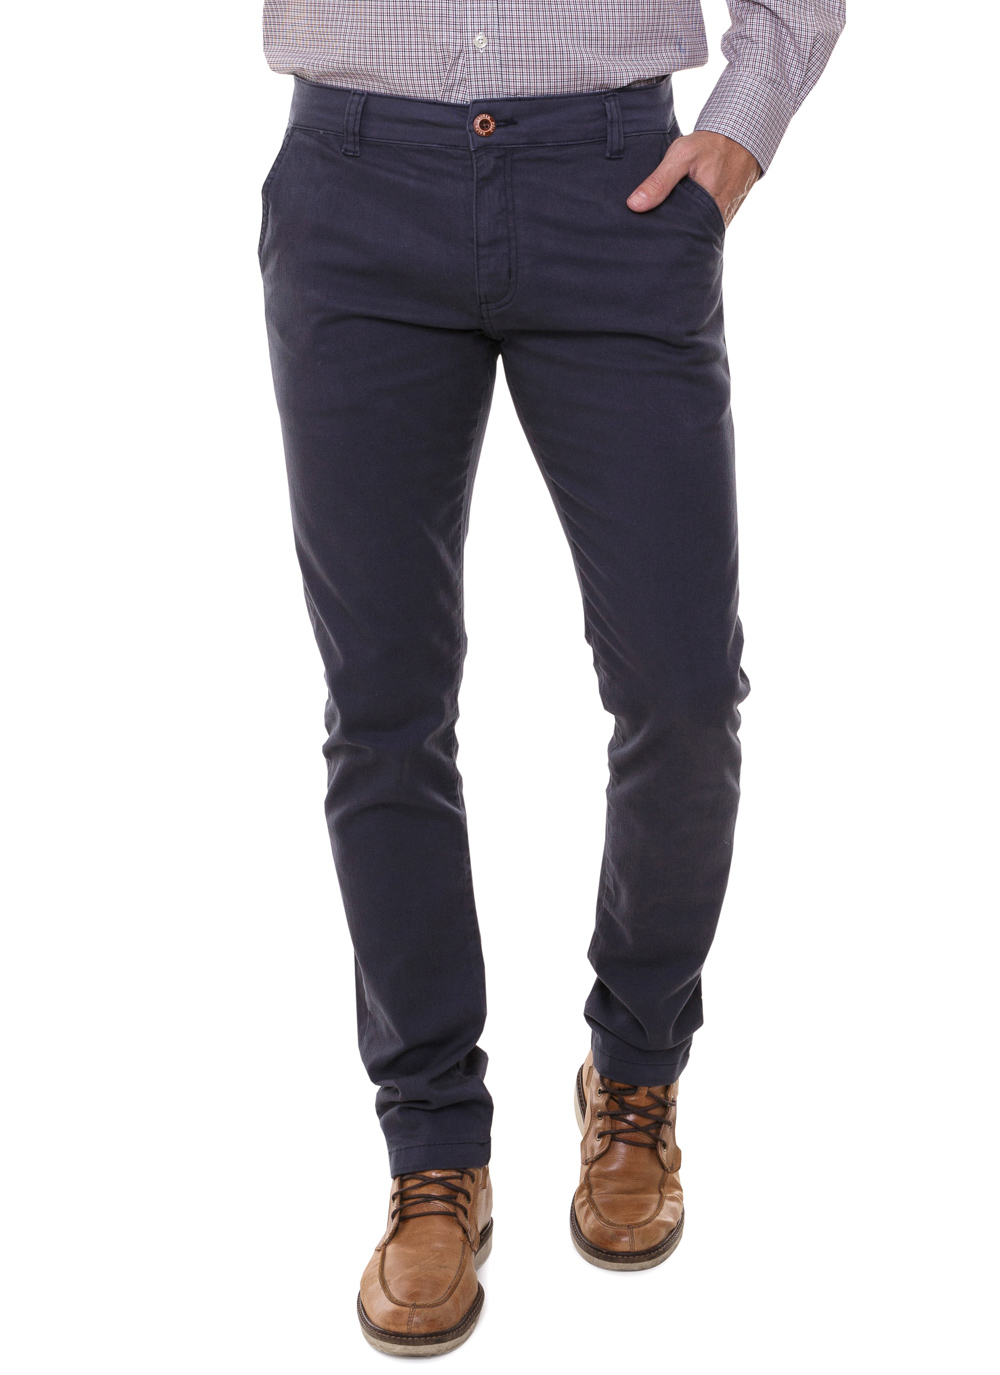 Calça Ralph Lauren de Sarja Chino Stretch Slim Fit Azul Escuro